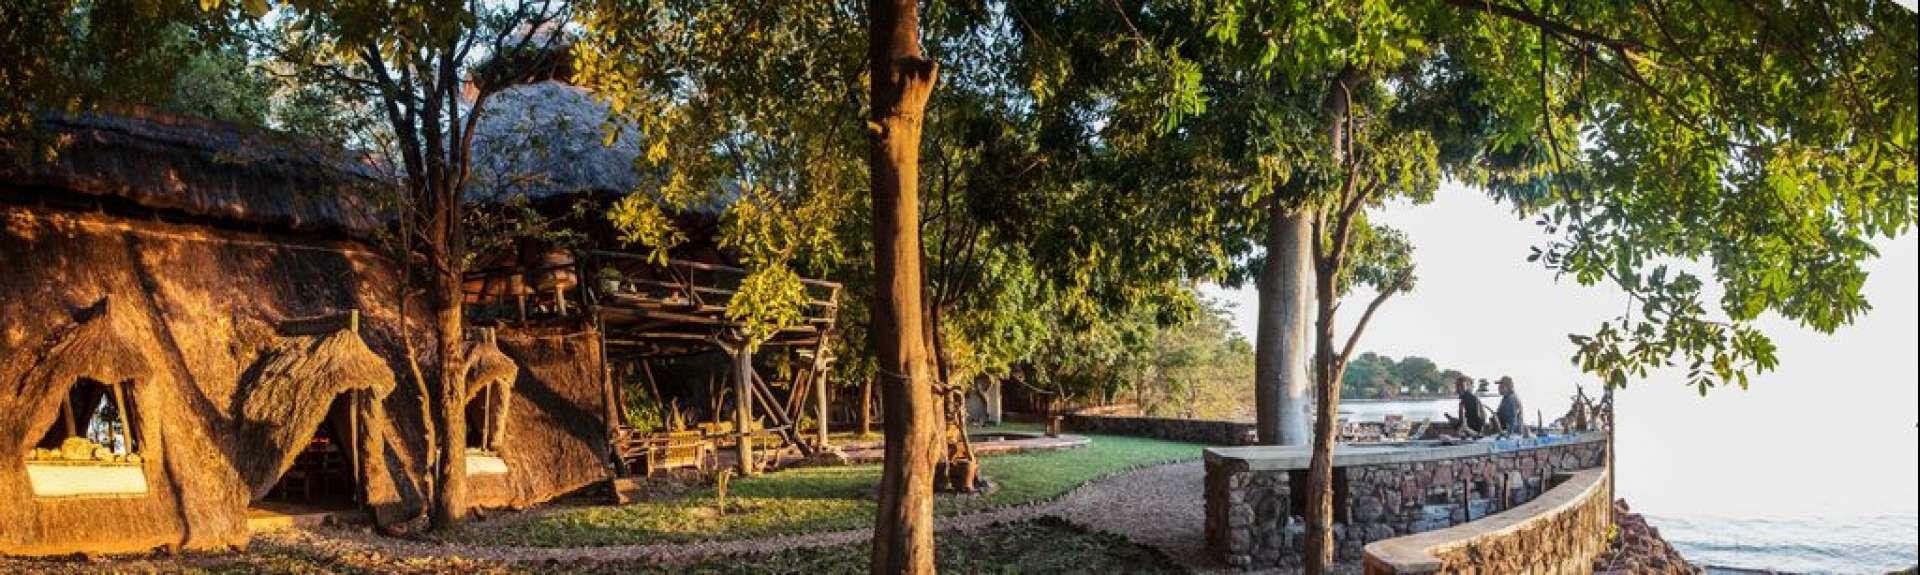 Musango Safari Camp in Zimbabwe